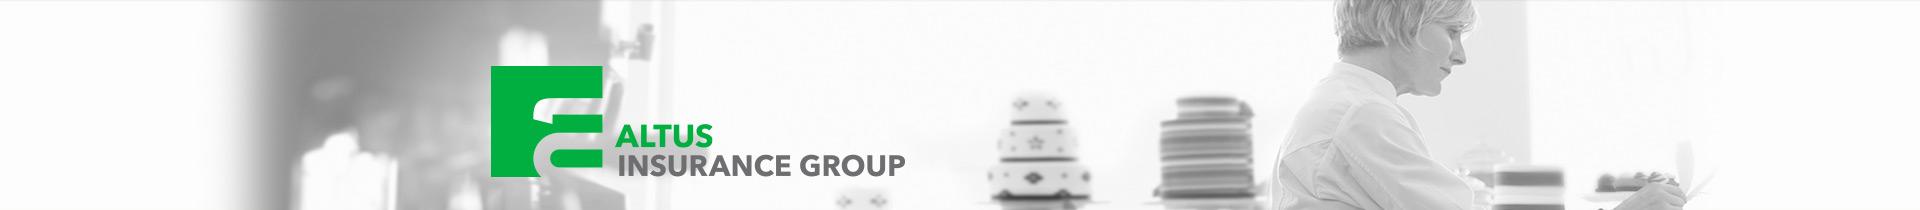 Altus Insurance Group Reno